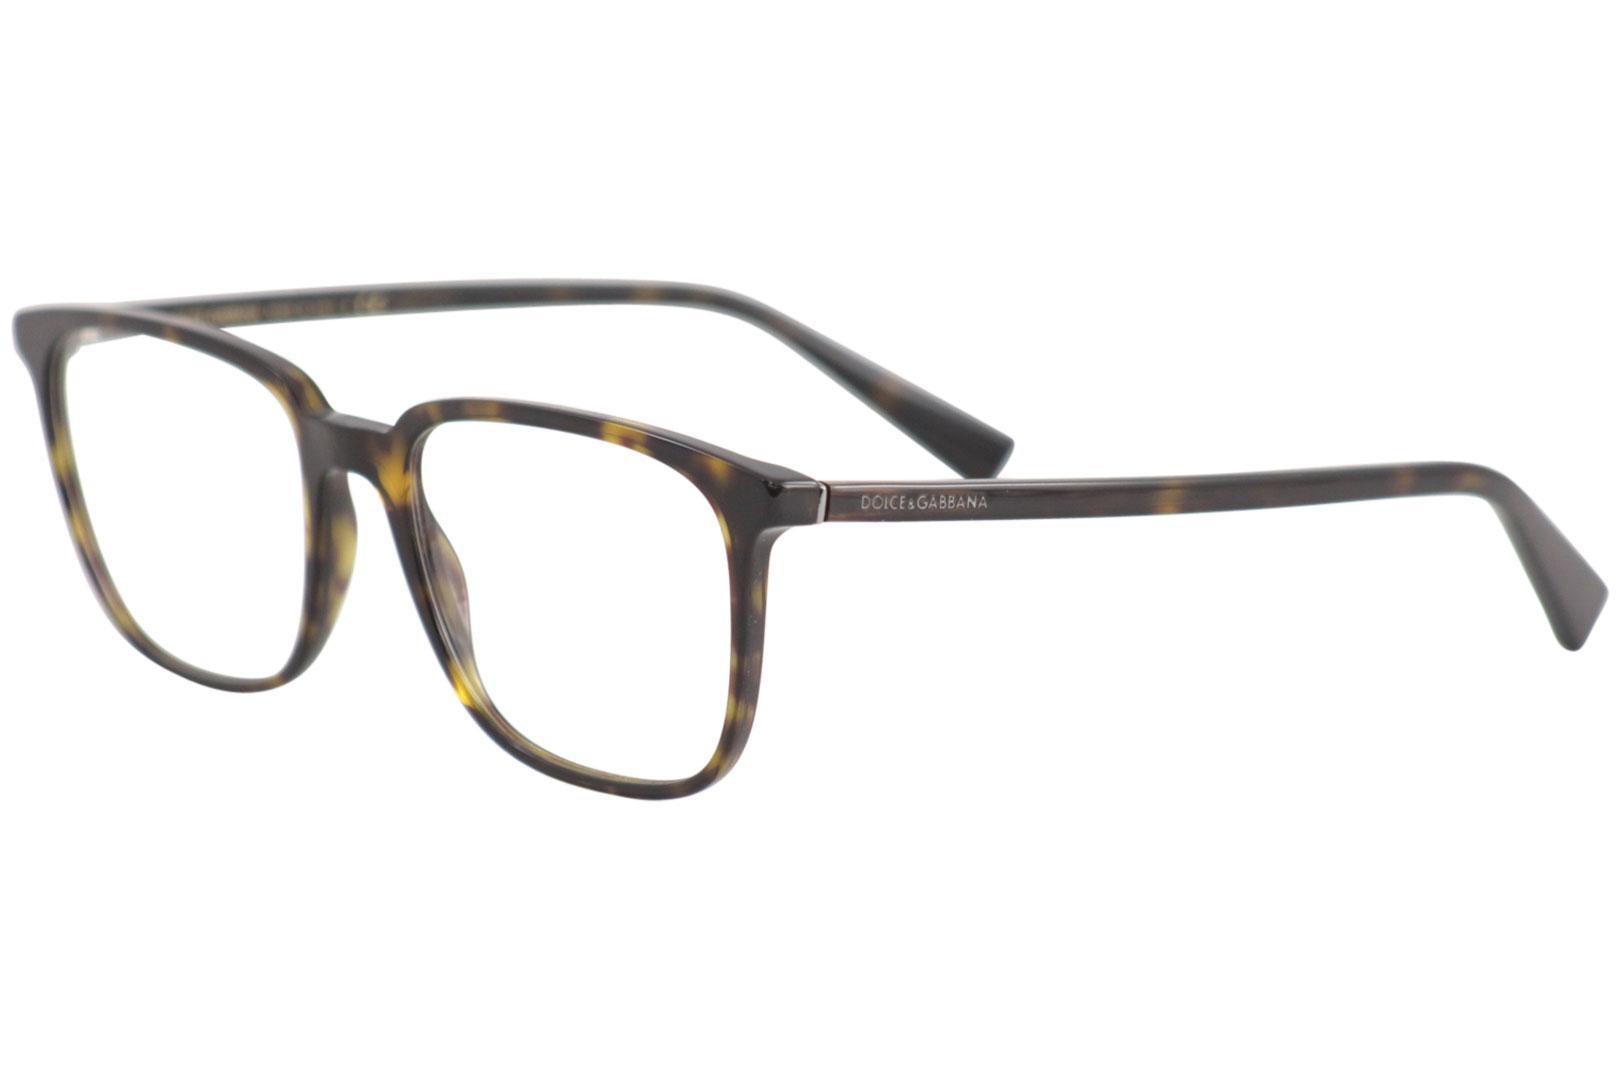 016794c044c9a7 Dolce   Gabbana Eyeglasses D G DG3298 DG 3298 502 Havana Optical ...